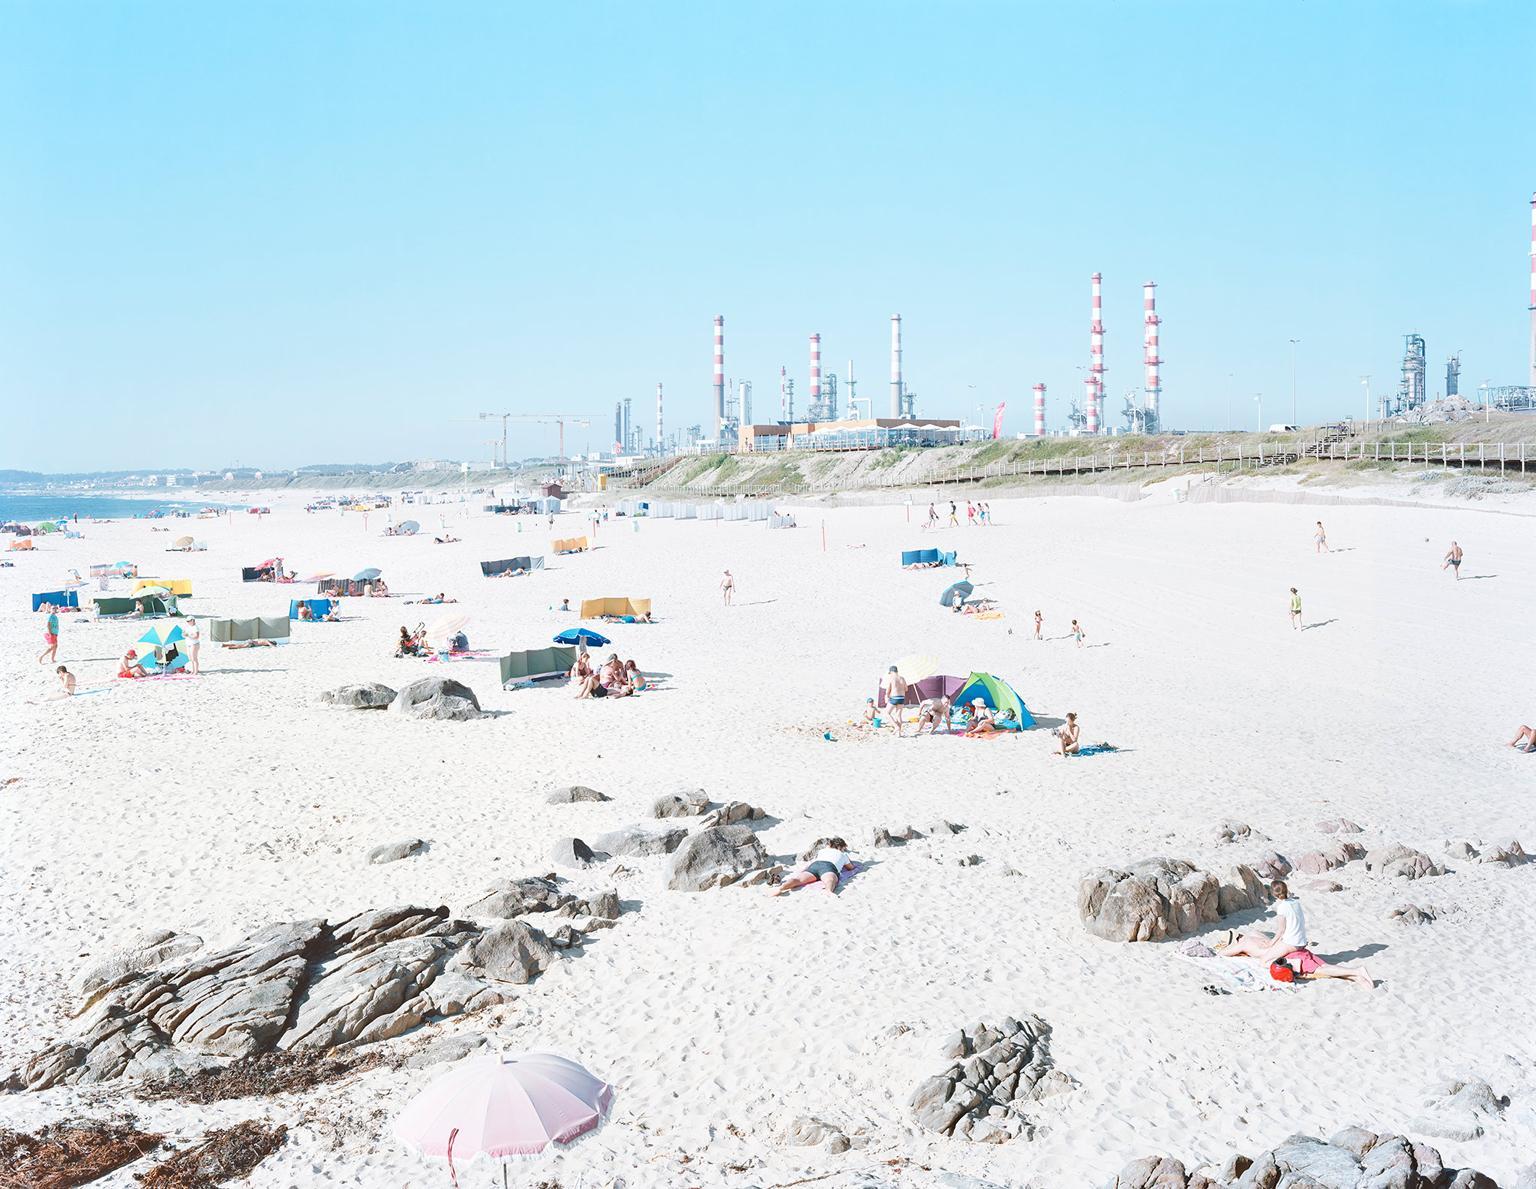 Praia do Aterro Galp Matosinhos large scale iconic beach scene (artist framed)